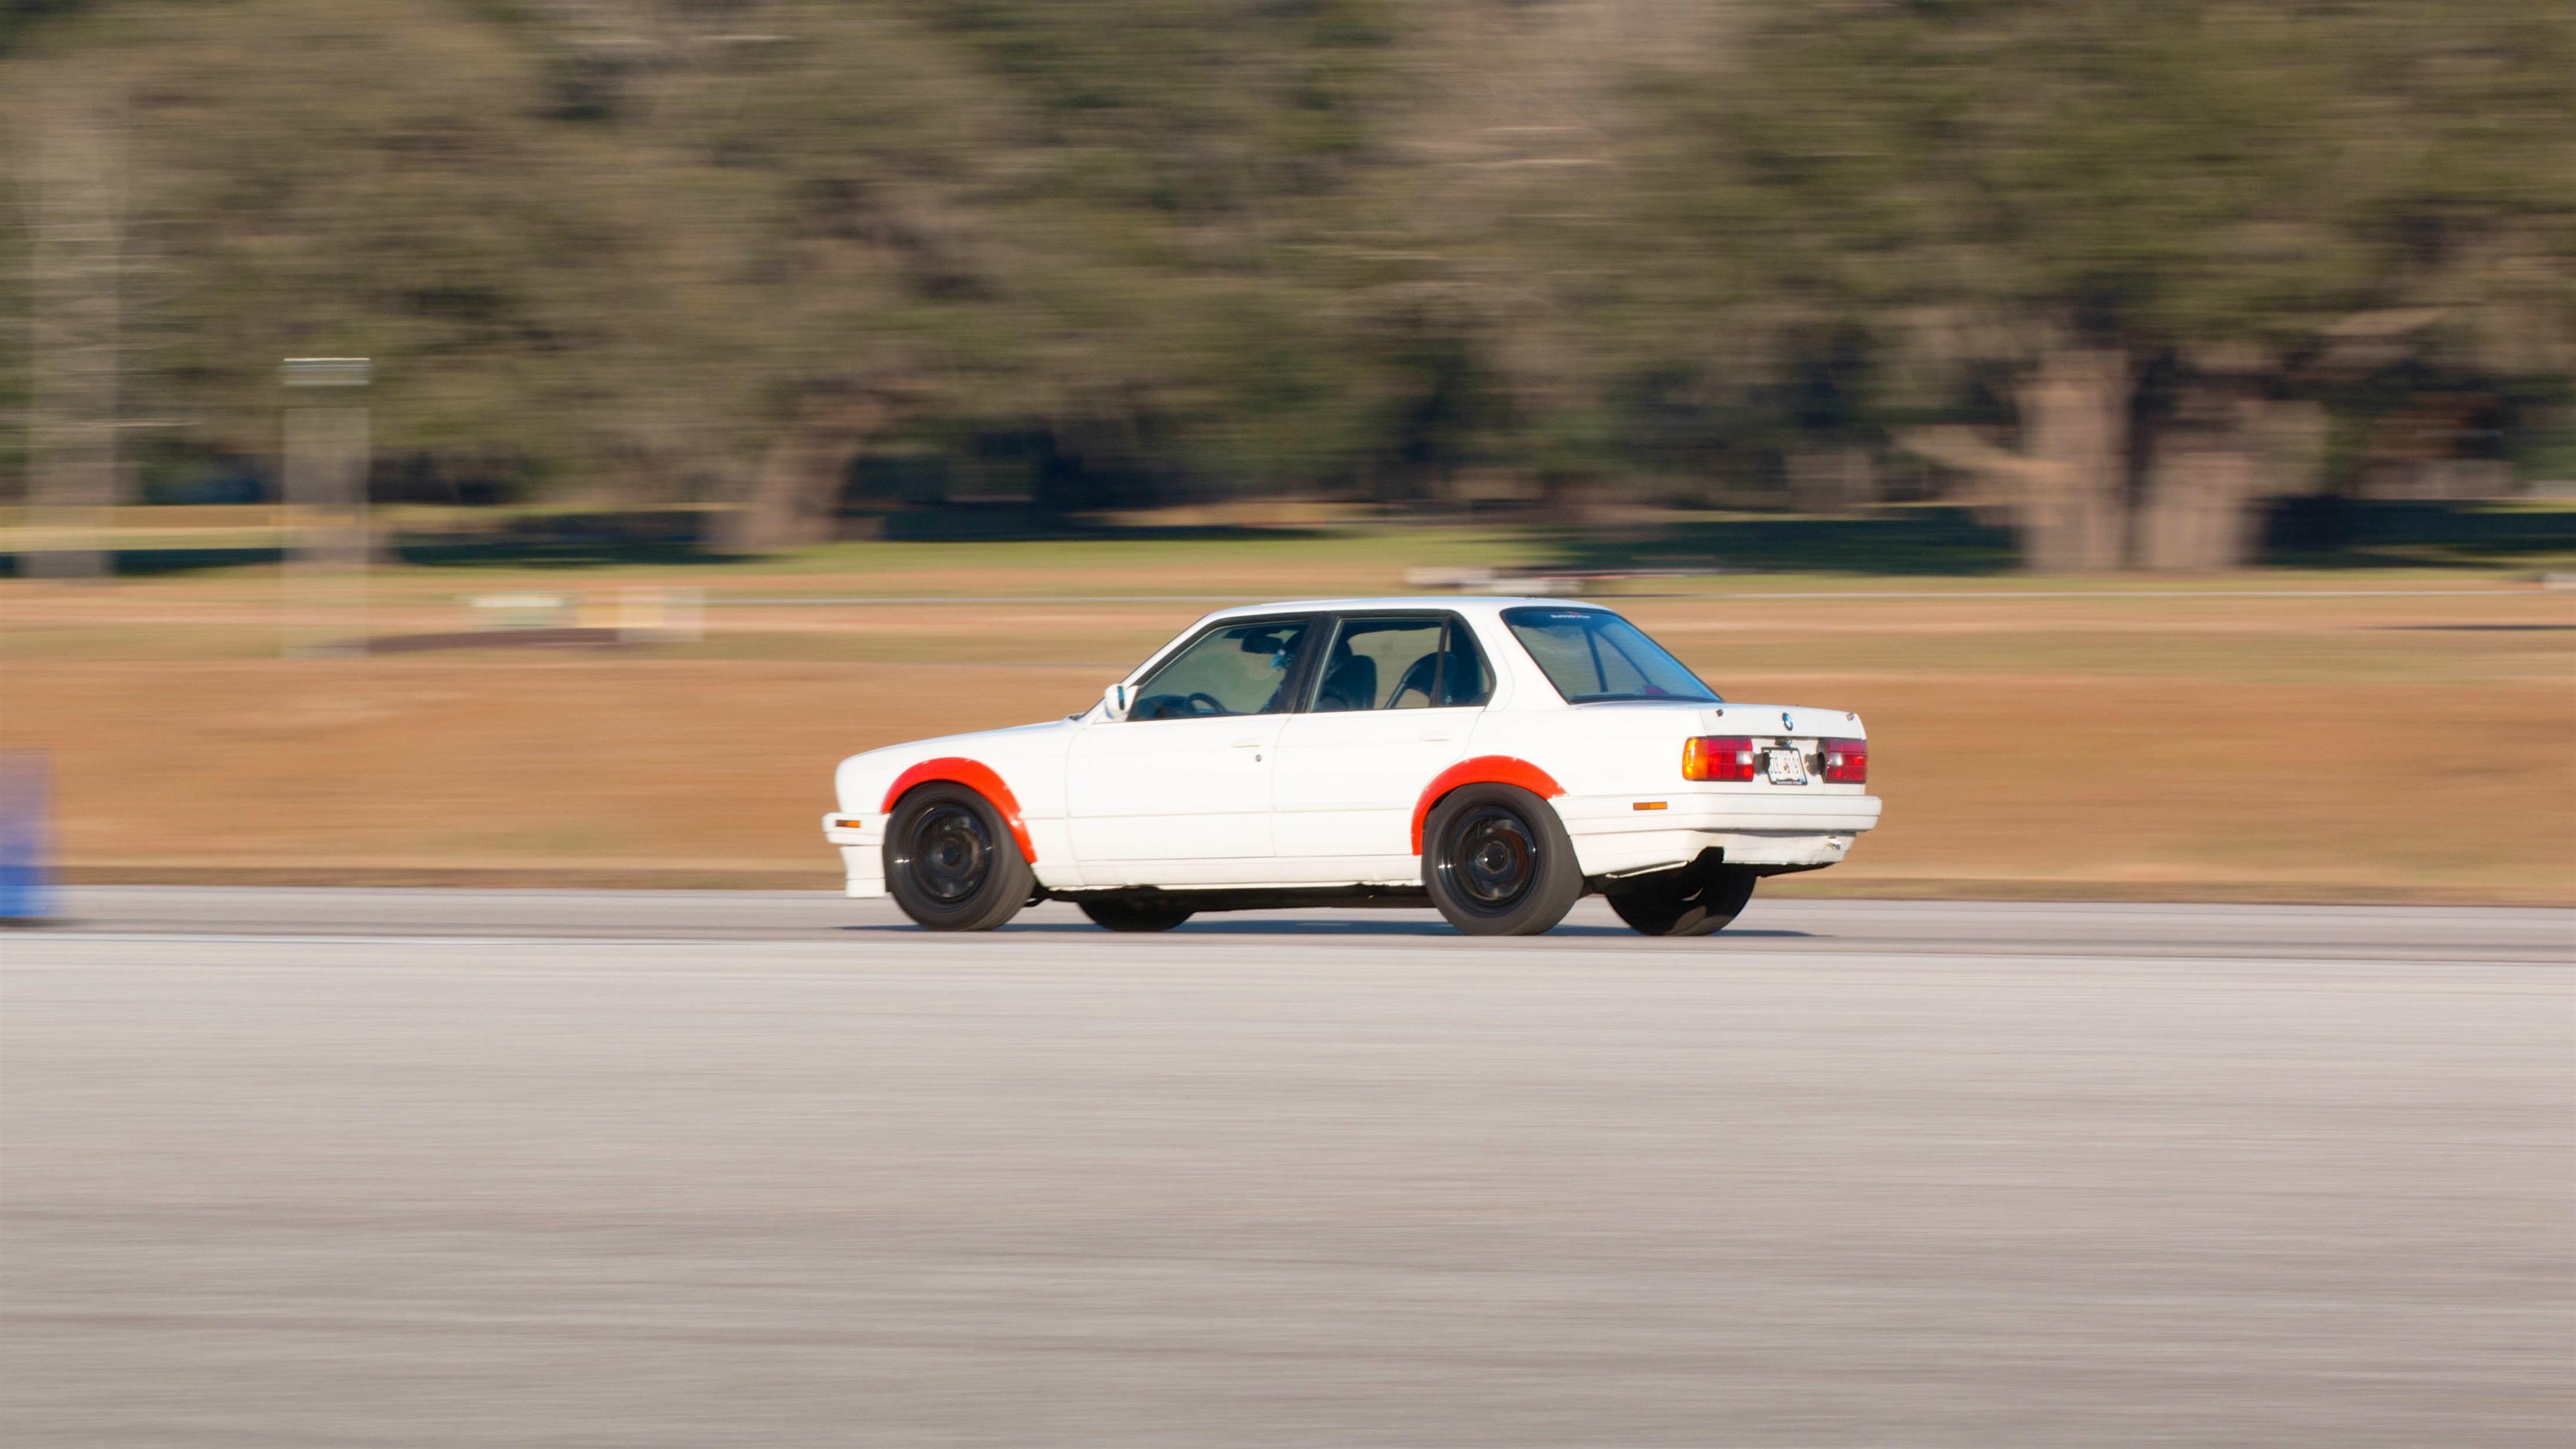 Bmw Specialist Near Me >> Solo Motorsports - Johns Creek in Alpharetta, GA   Whitepages